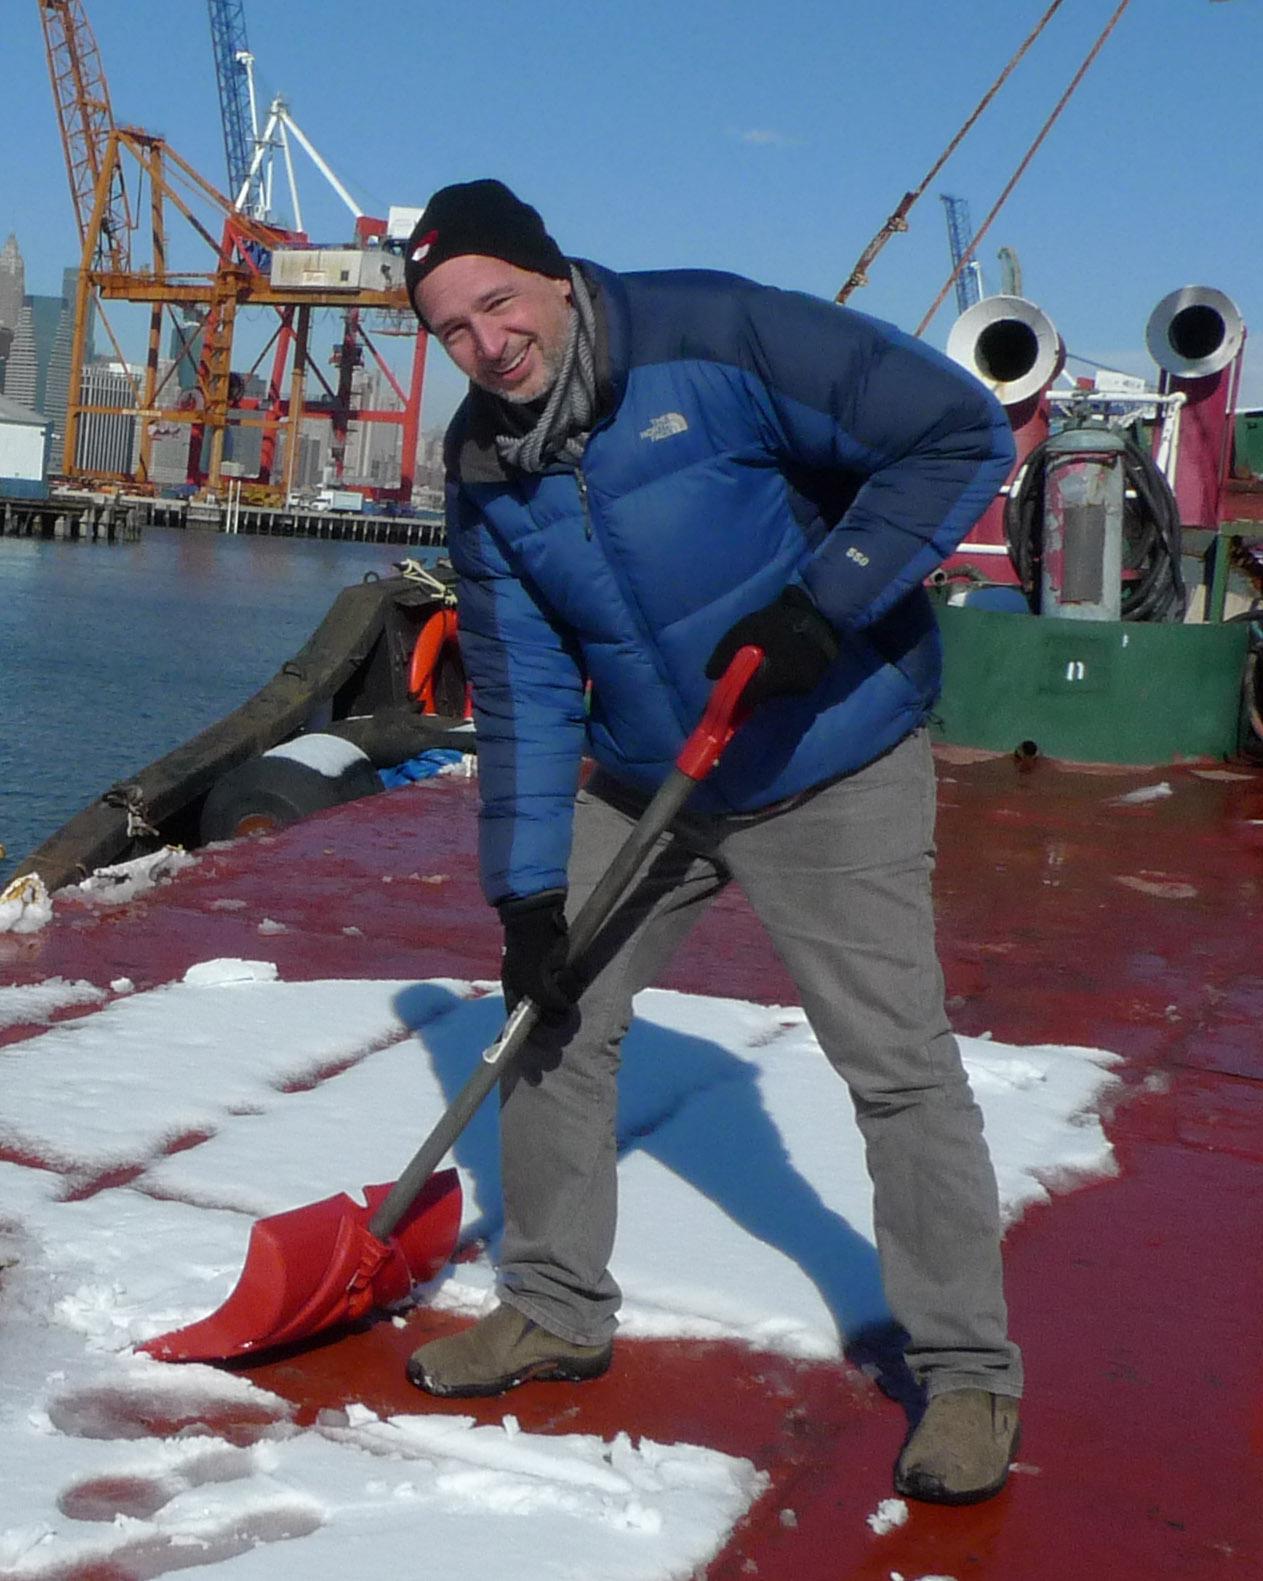 160209 David Levine shovelling snow (1) crop.jpg